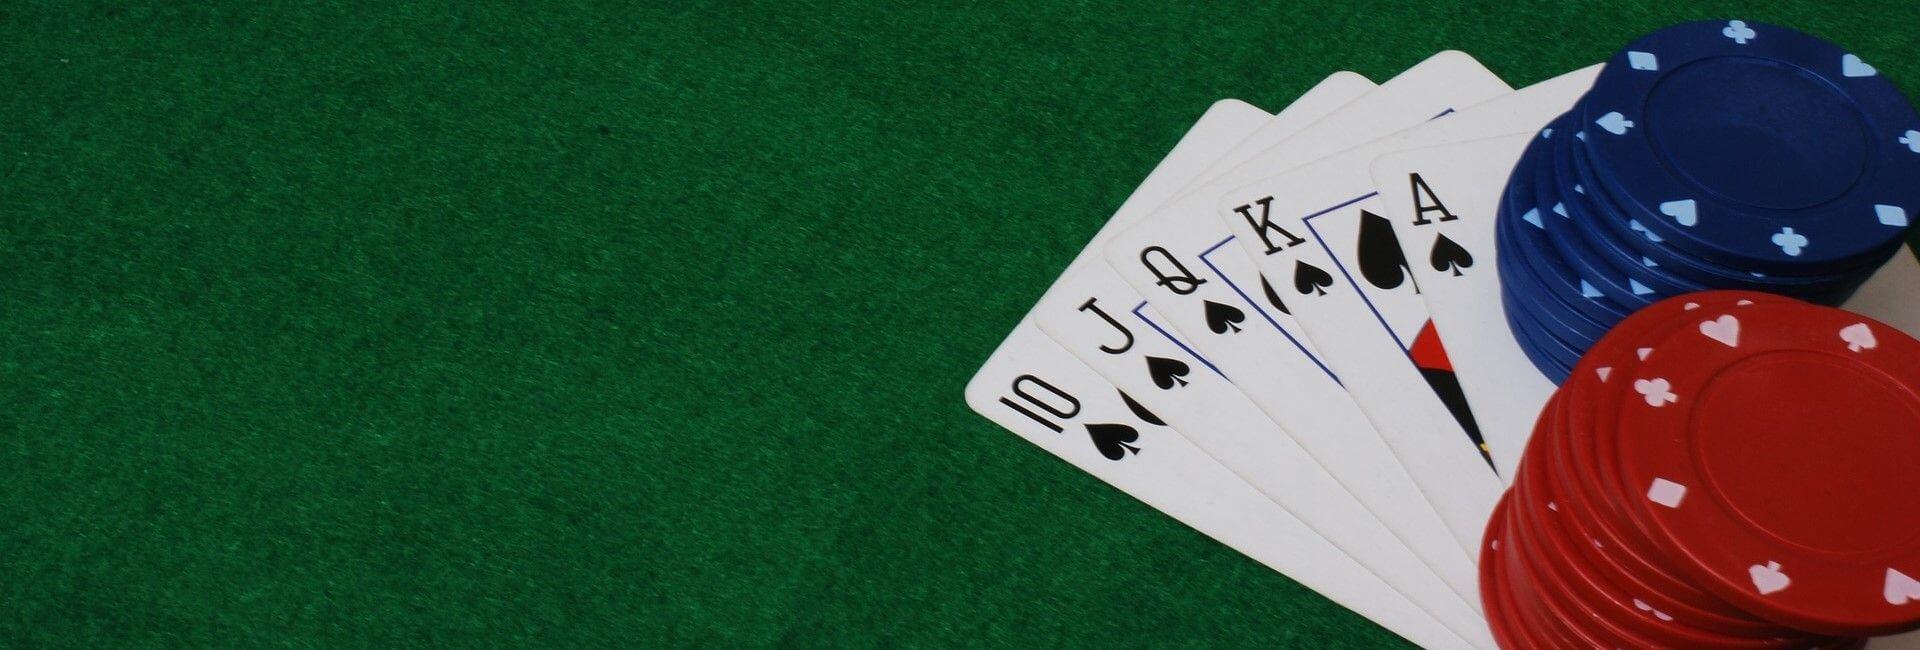 Coolbet Poker